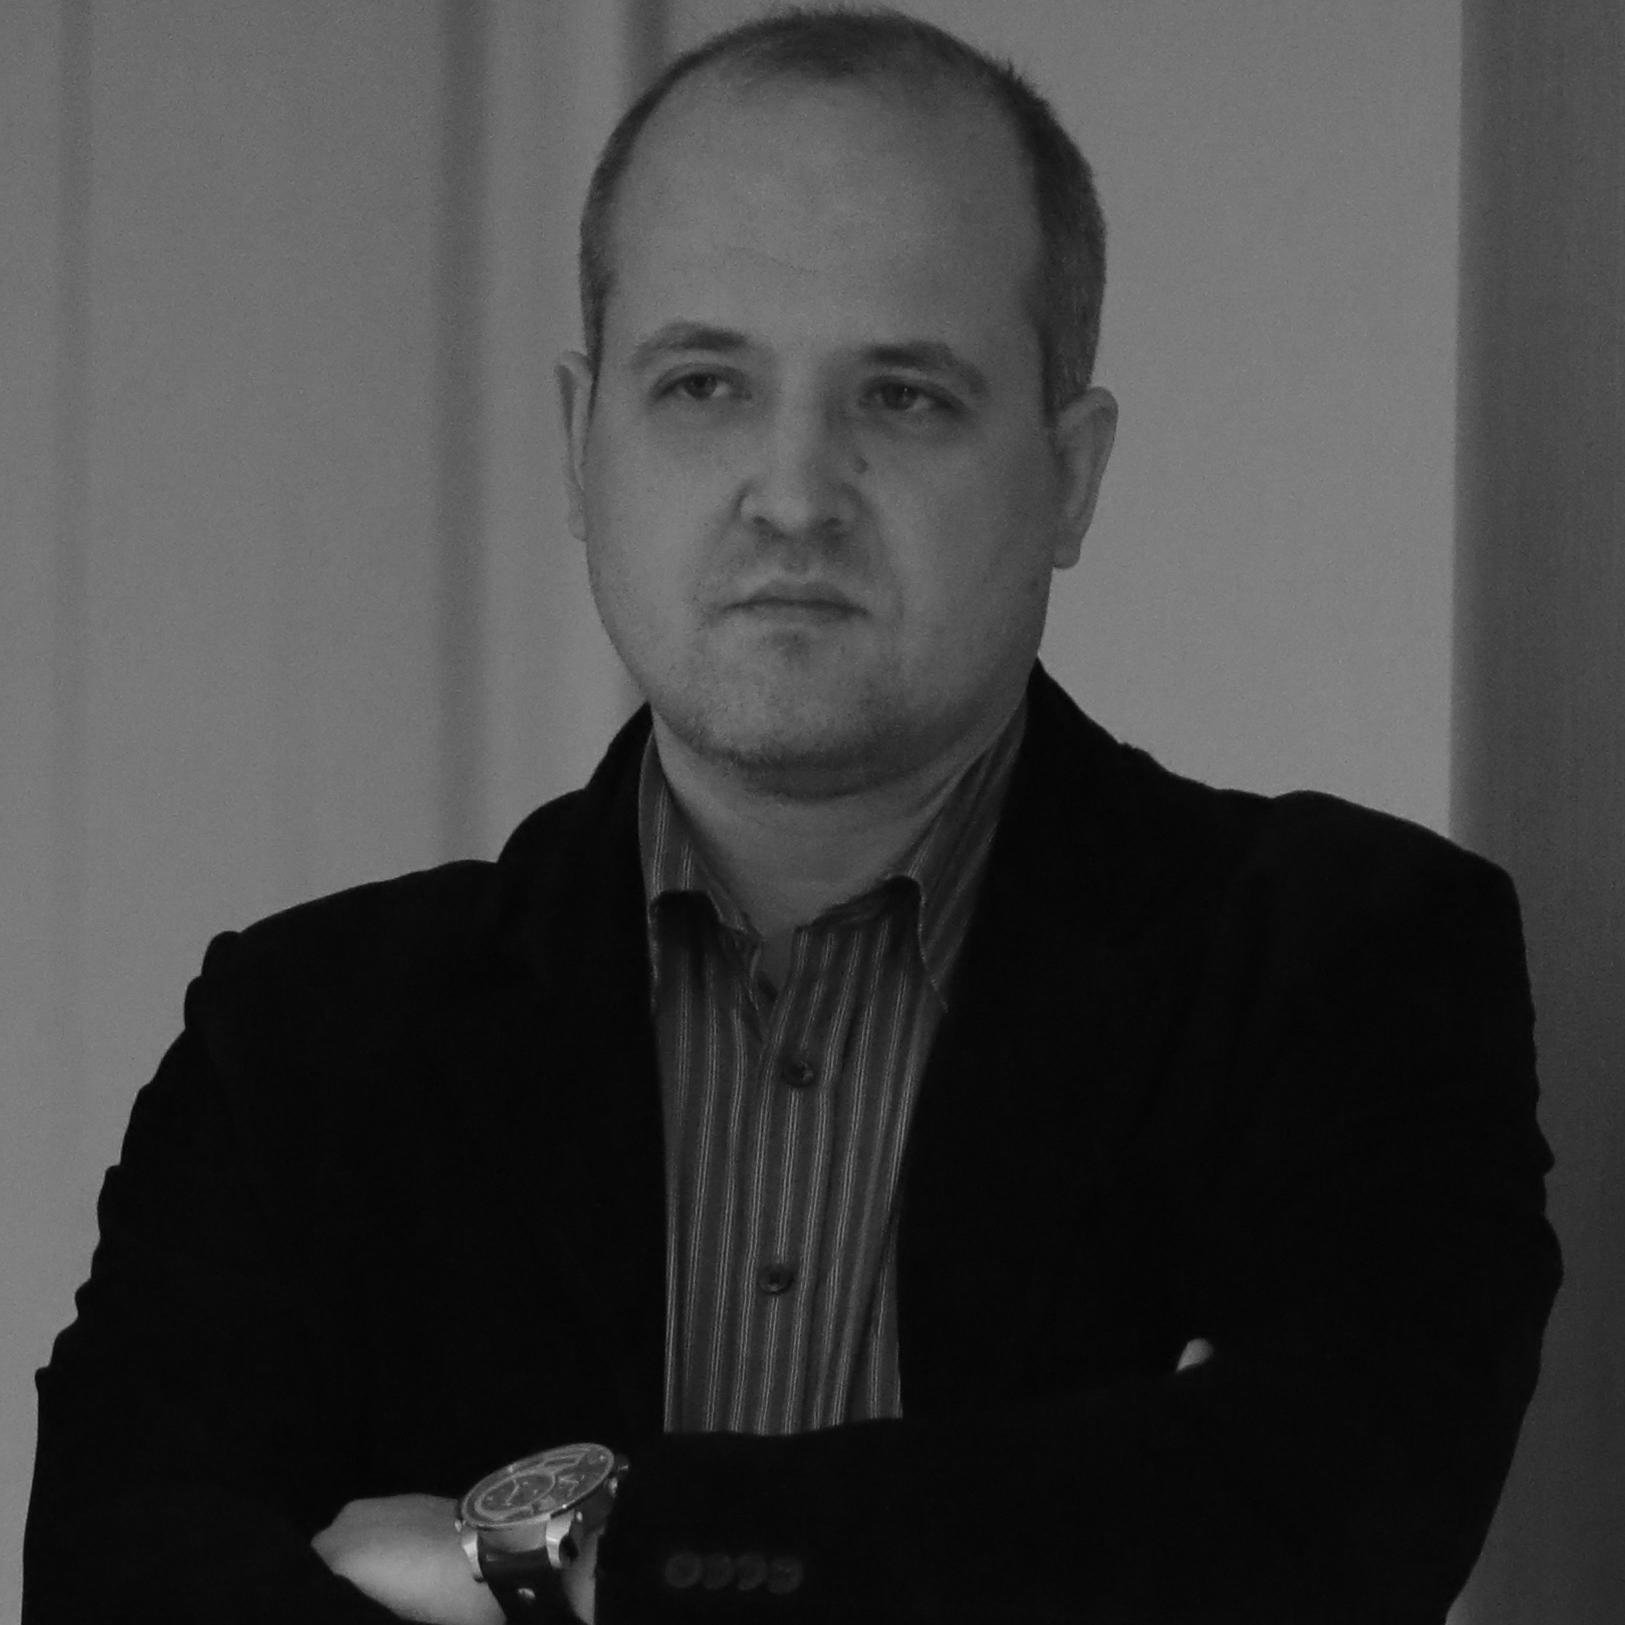 DENIS SNITSEREV